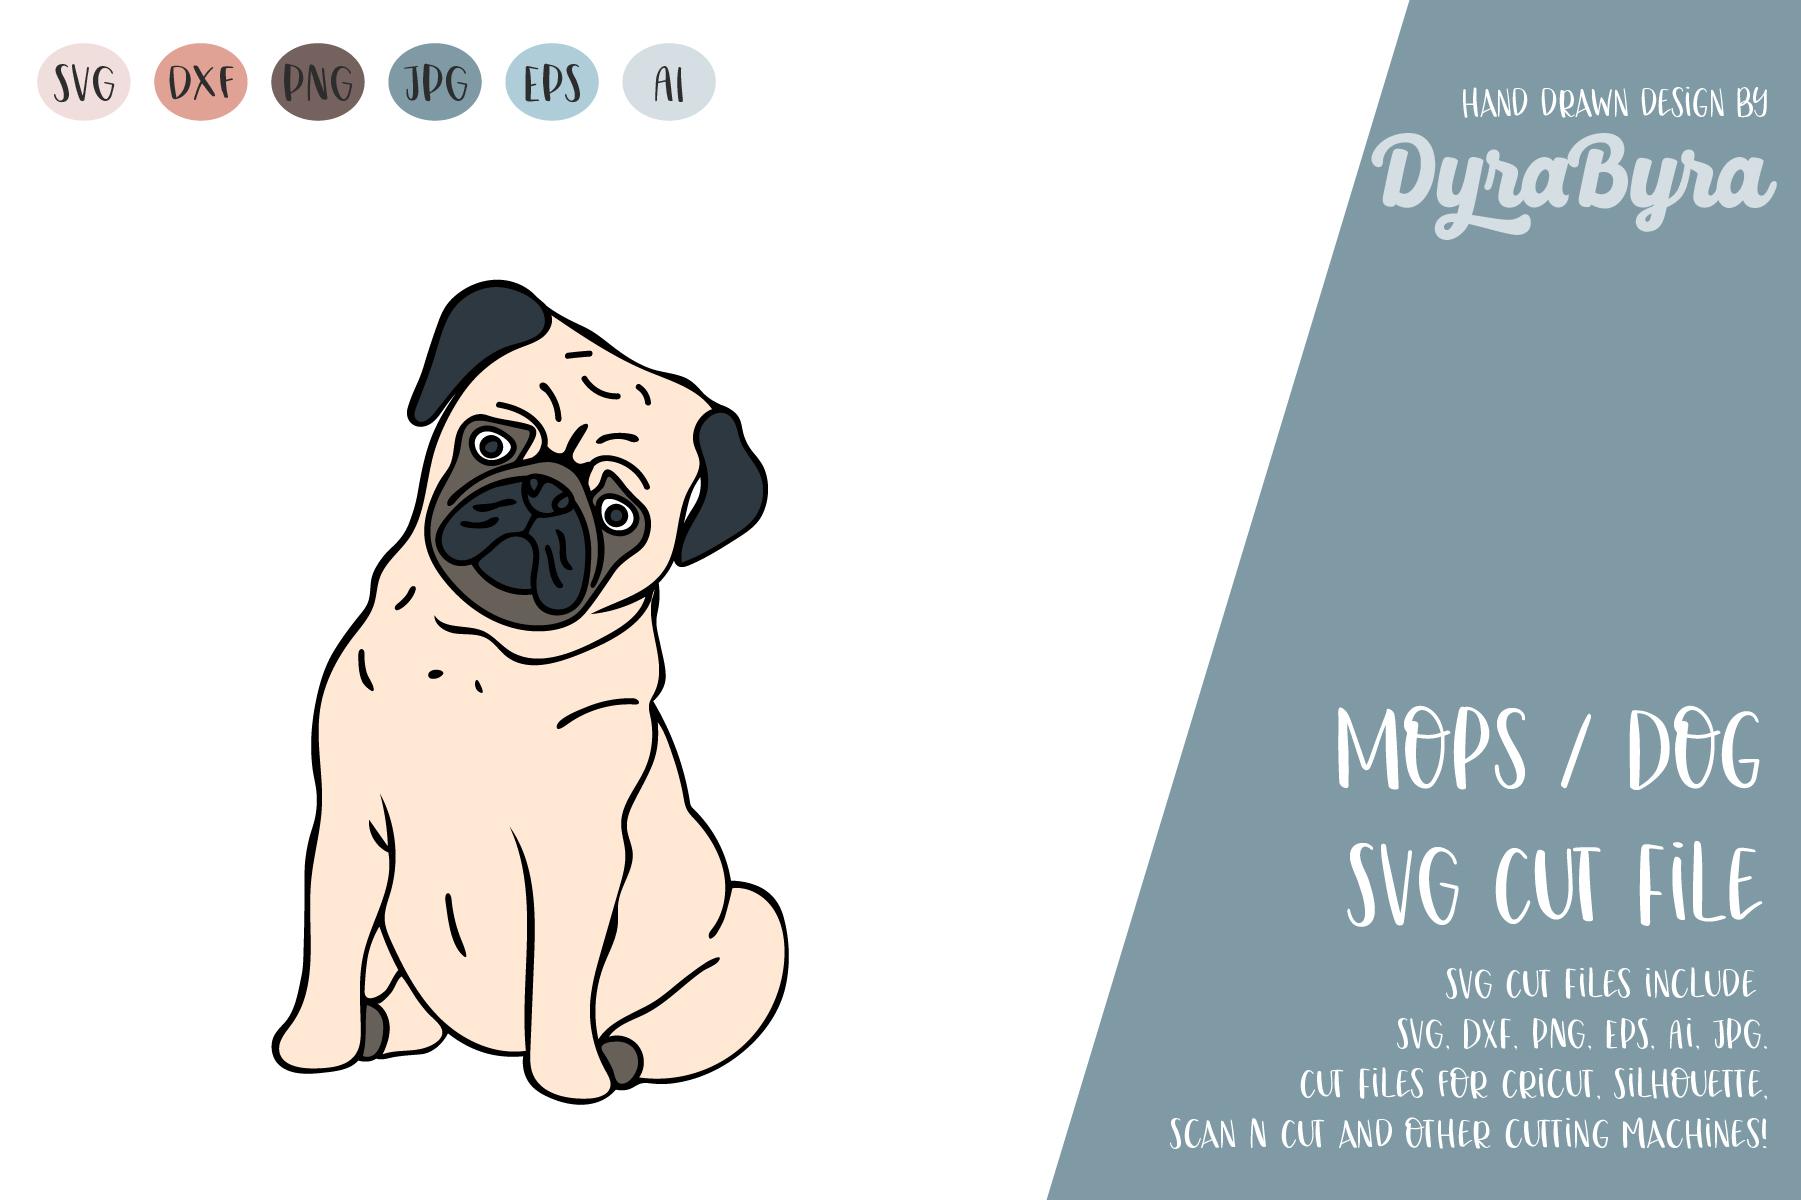 PUG Dog SVG / Mops SVG / Dogs love SVG Vector File example image 2